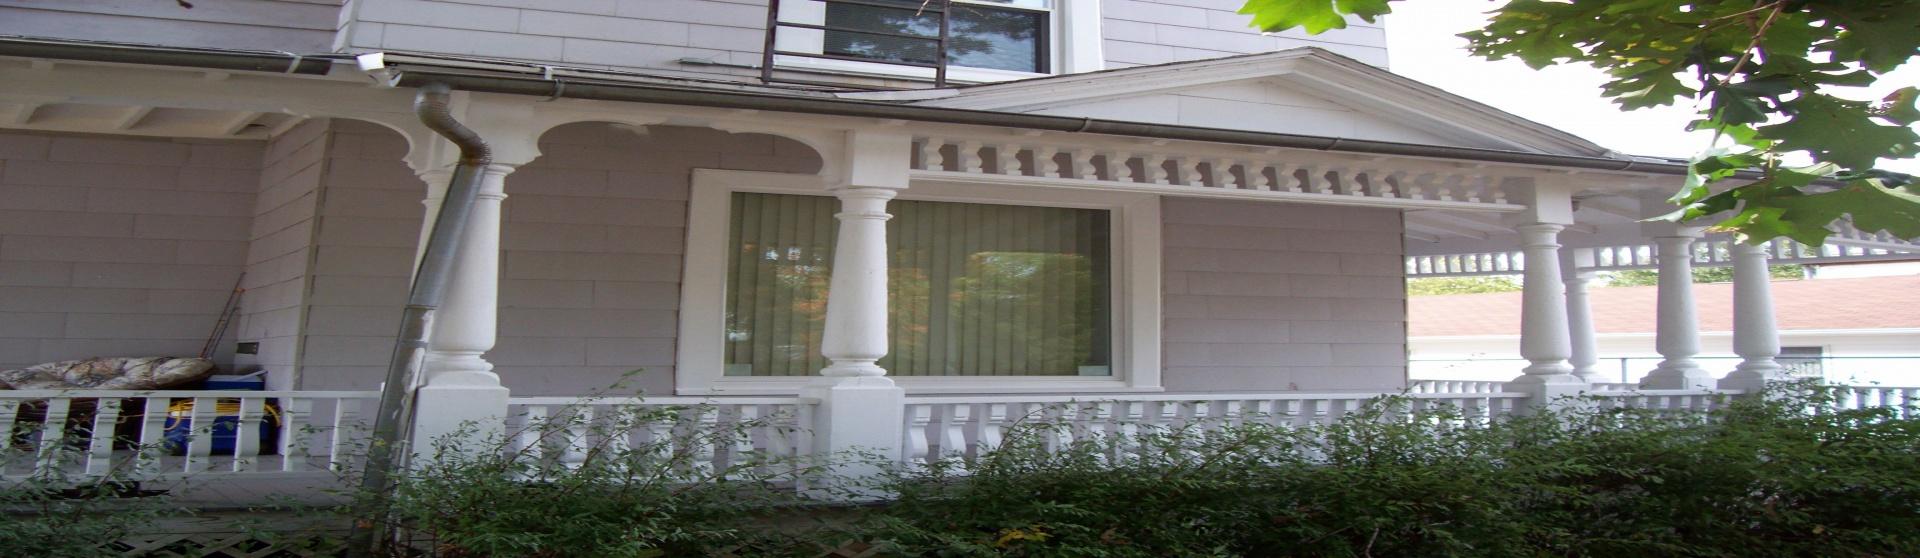 4 4 N. Eddy, Fort Scott, Bourbon County, Kansas, United States 66701, 1 Bedroom Bedrooms, ,1 BathroomBathrooms,Apartment,For Rent,4 N. Eddy,1,1009